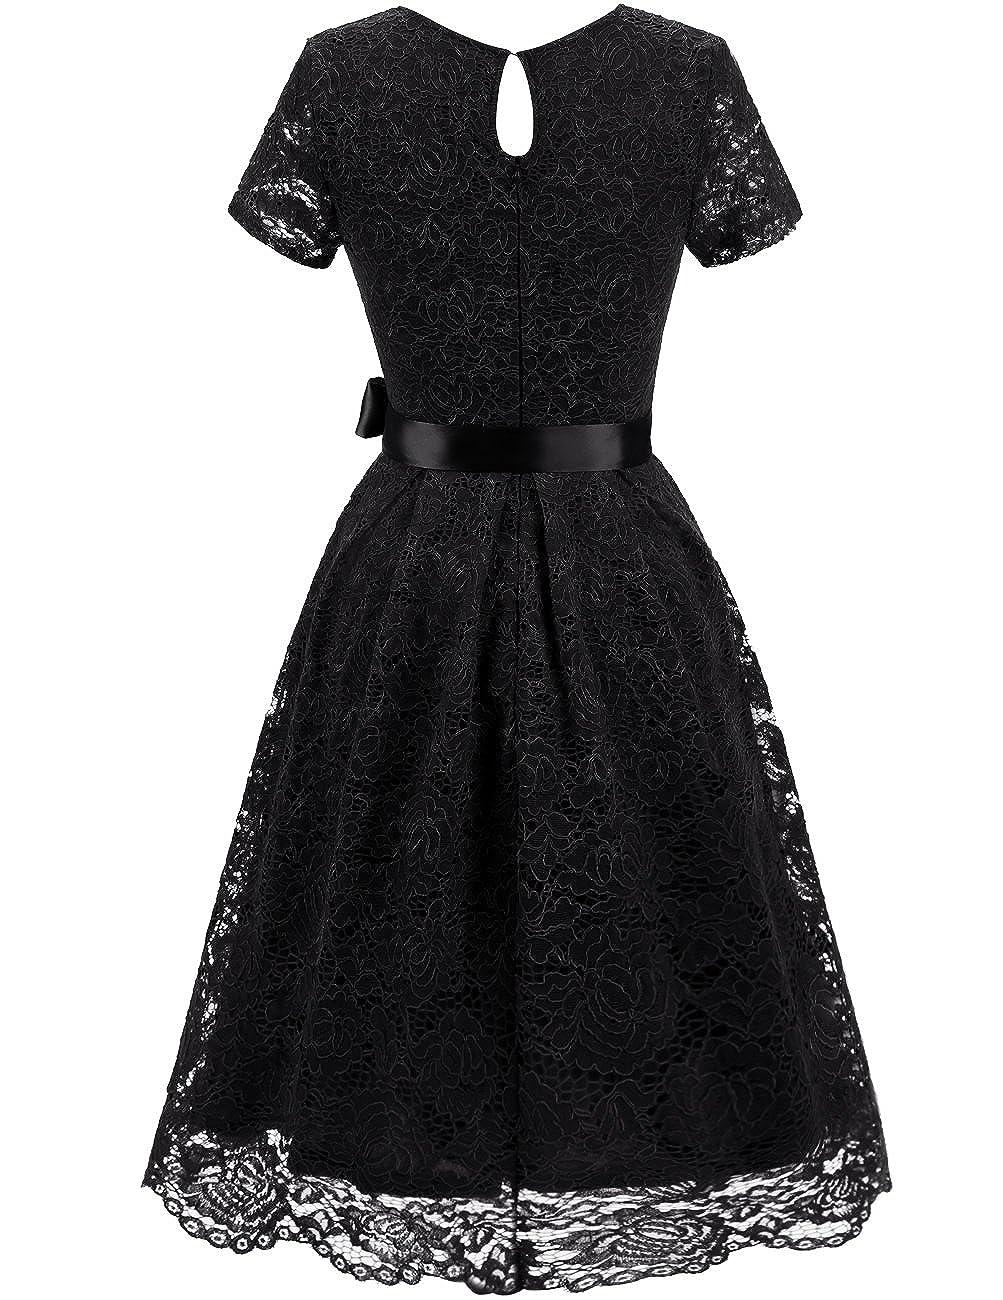 1774b6b3aa32a Amazon.com  Dresstells Women s Elegant Bridesmaid Dress Floral Lace Dresses  with Short Sleeves  Clothing